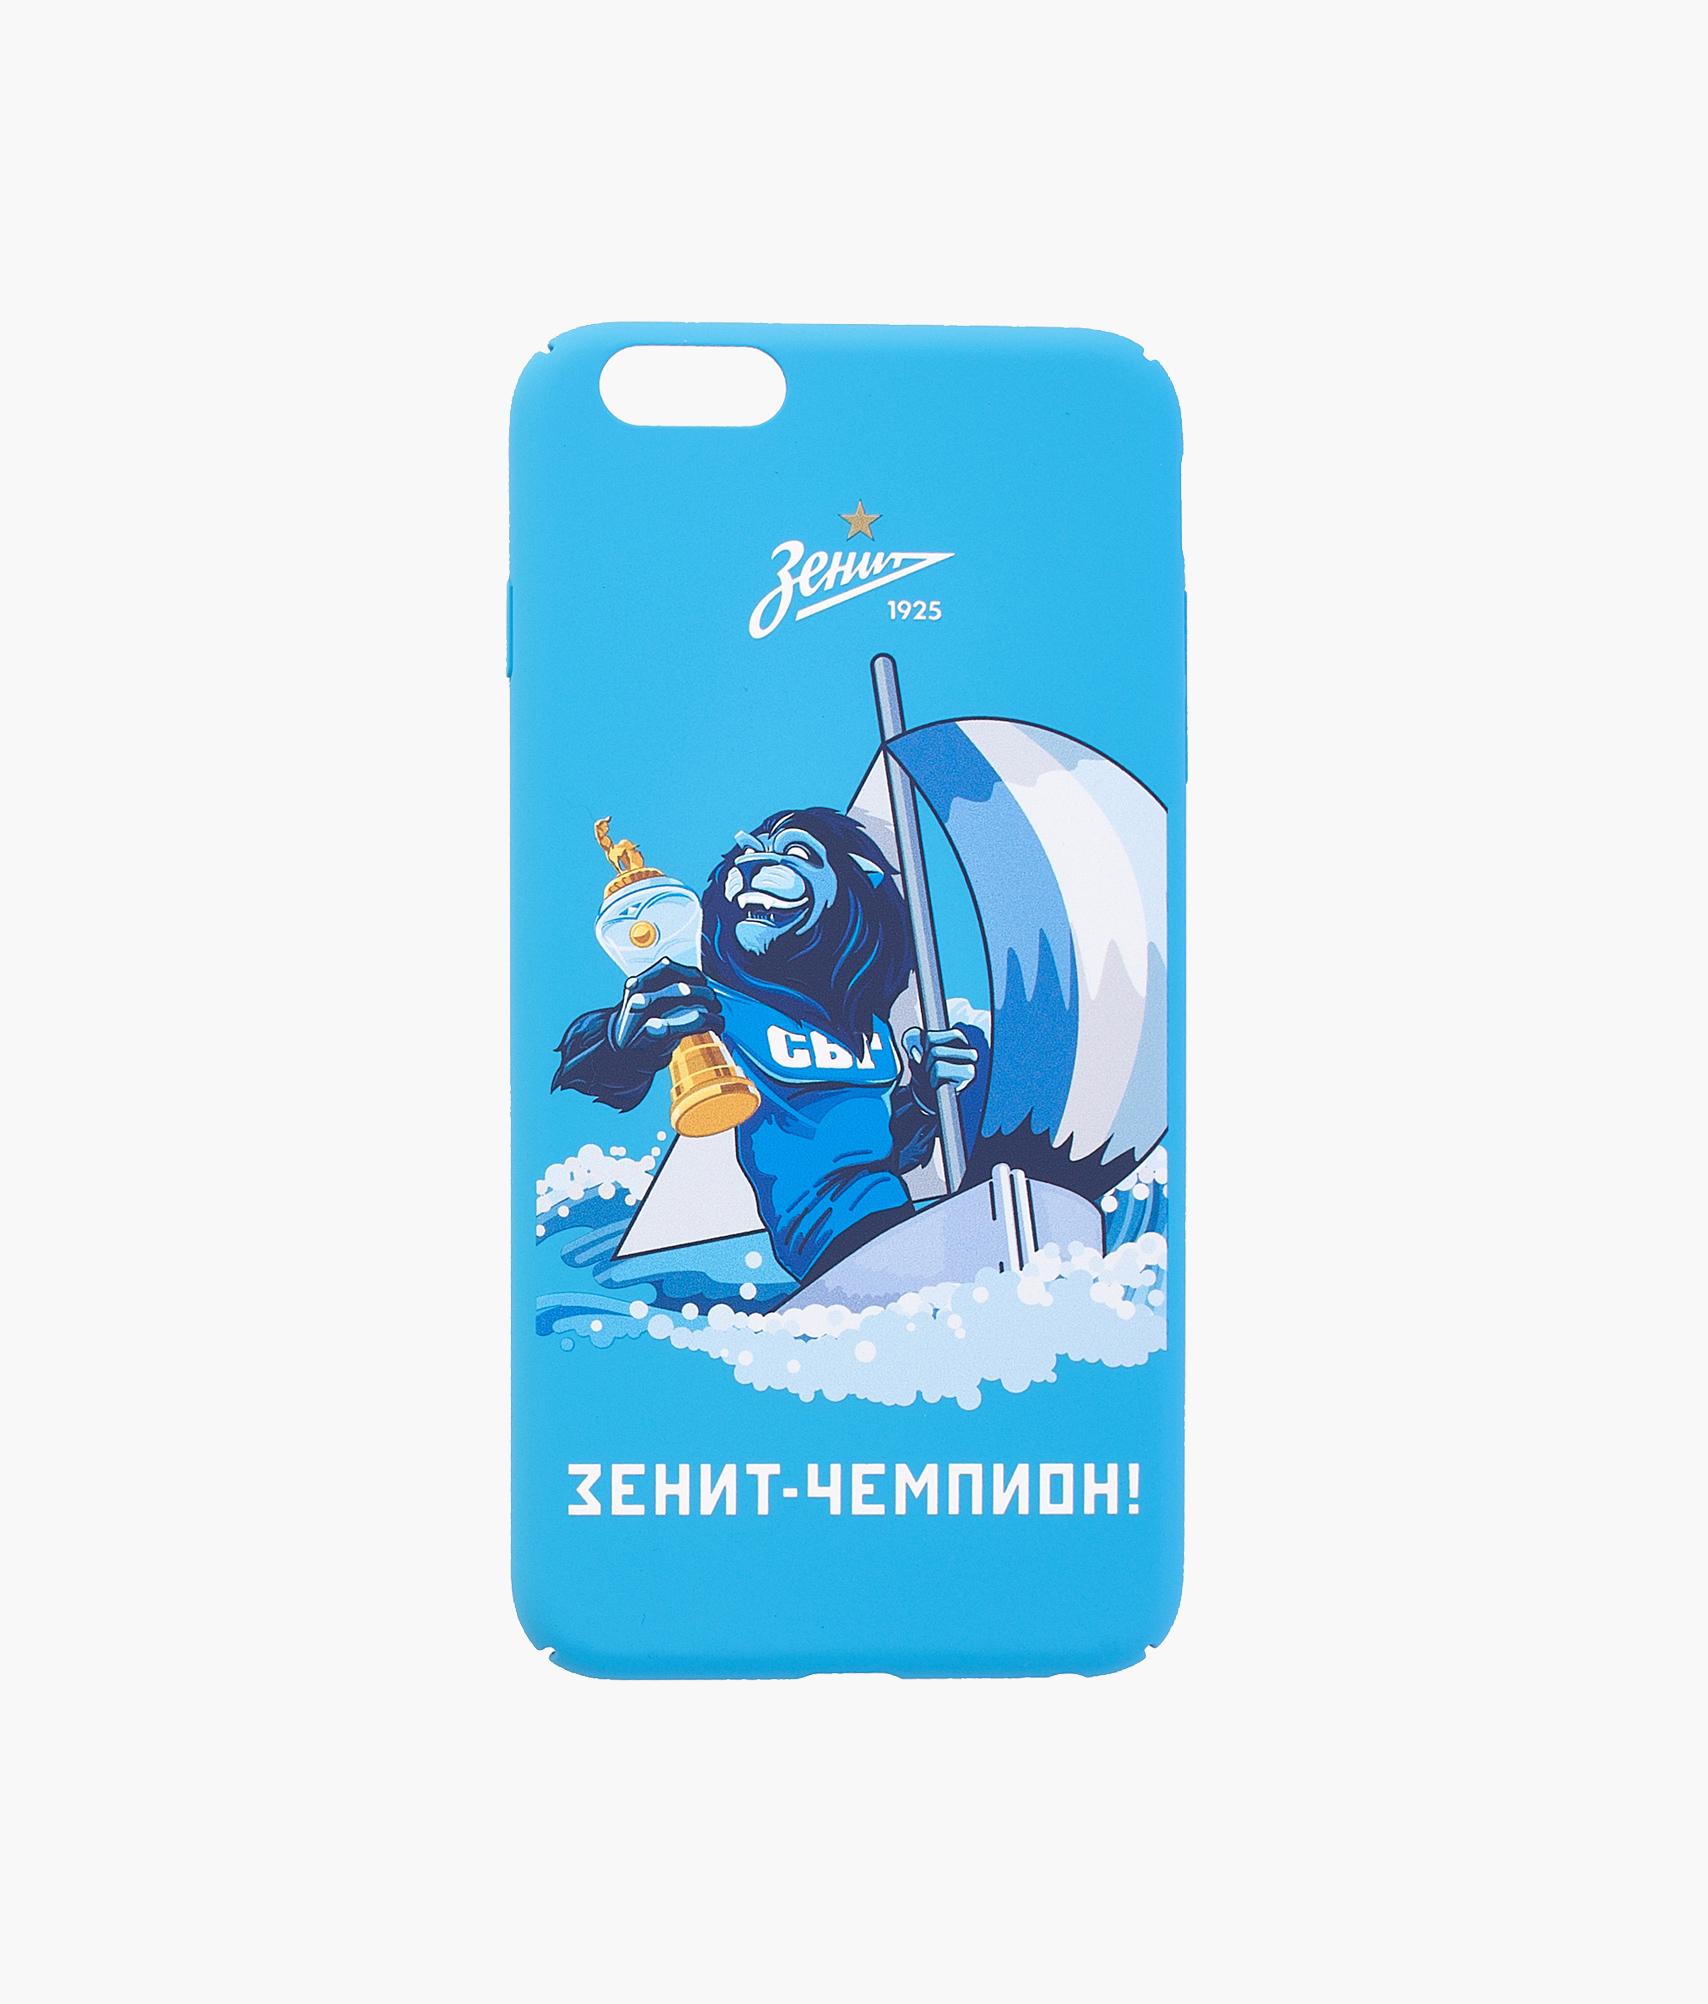 Фото - Чехол для IPhone 6/6S Plus «Лев» 2018/19 Зенит чехол